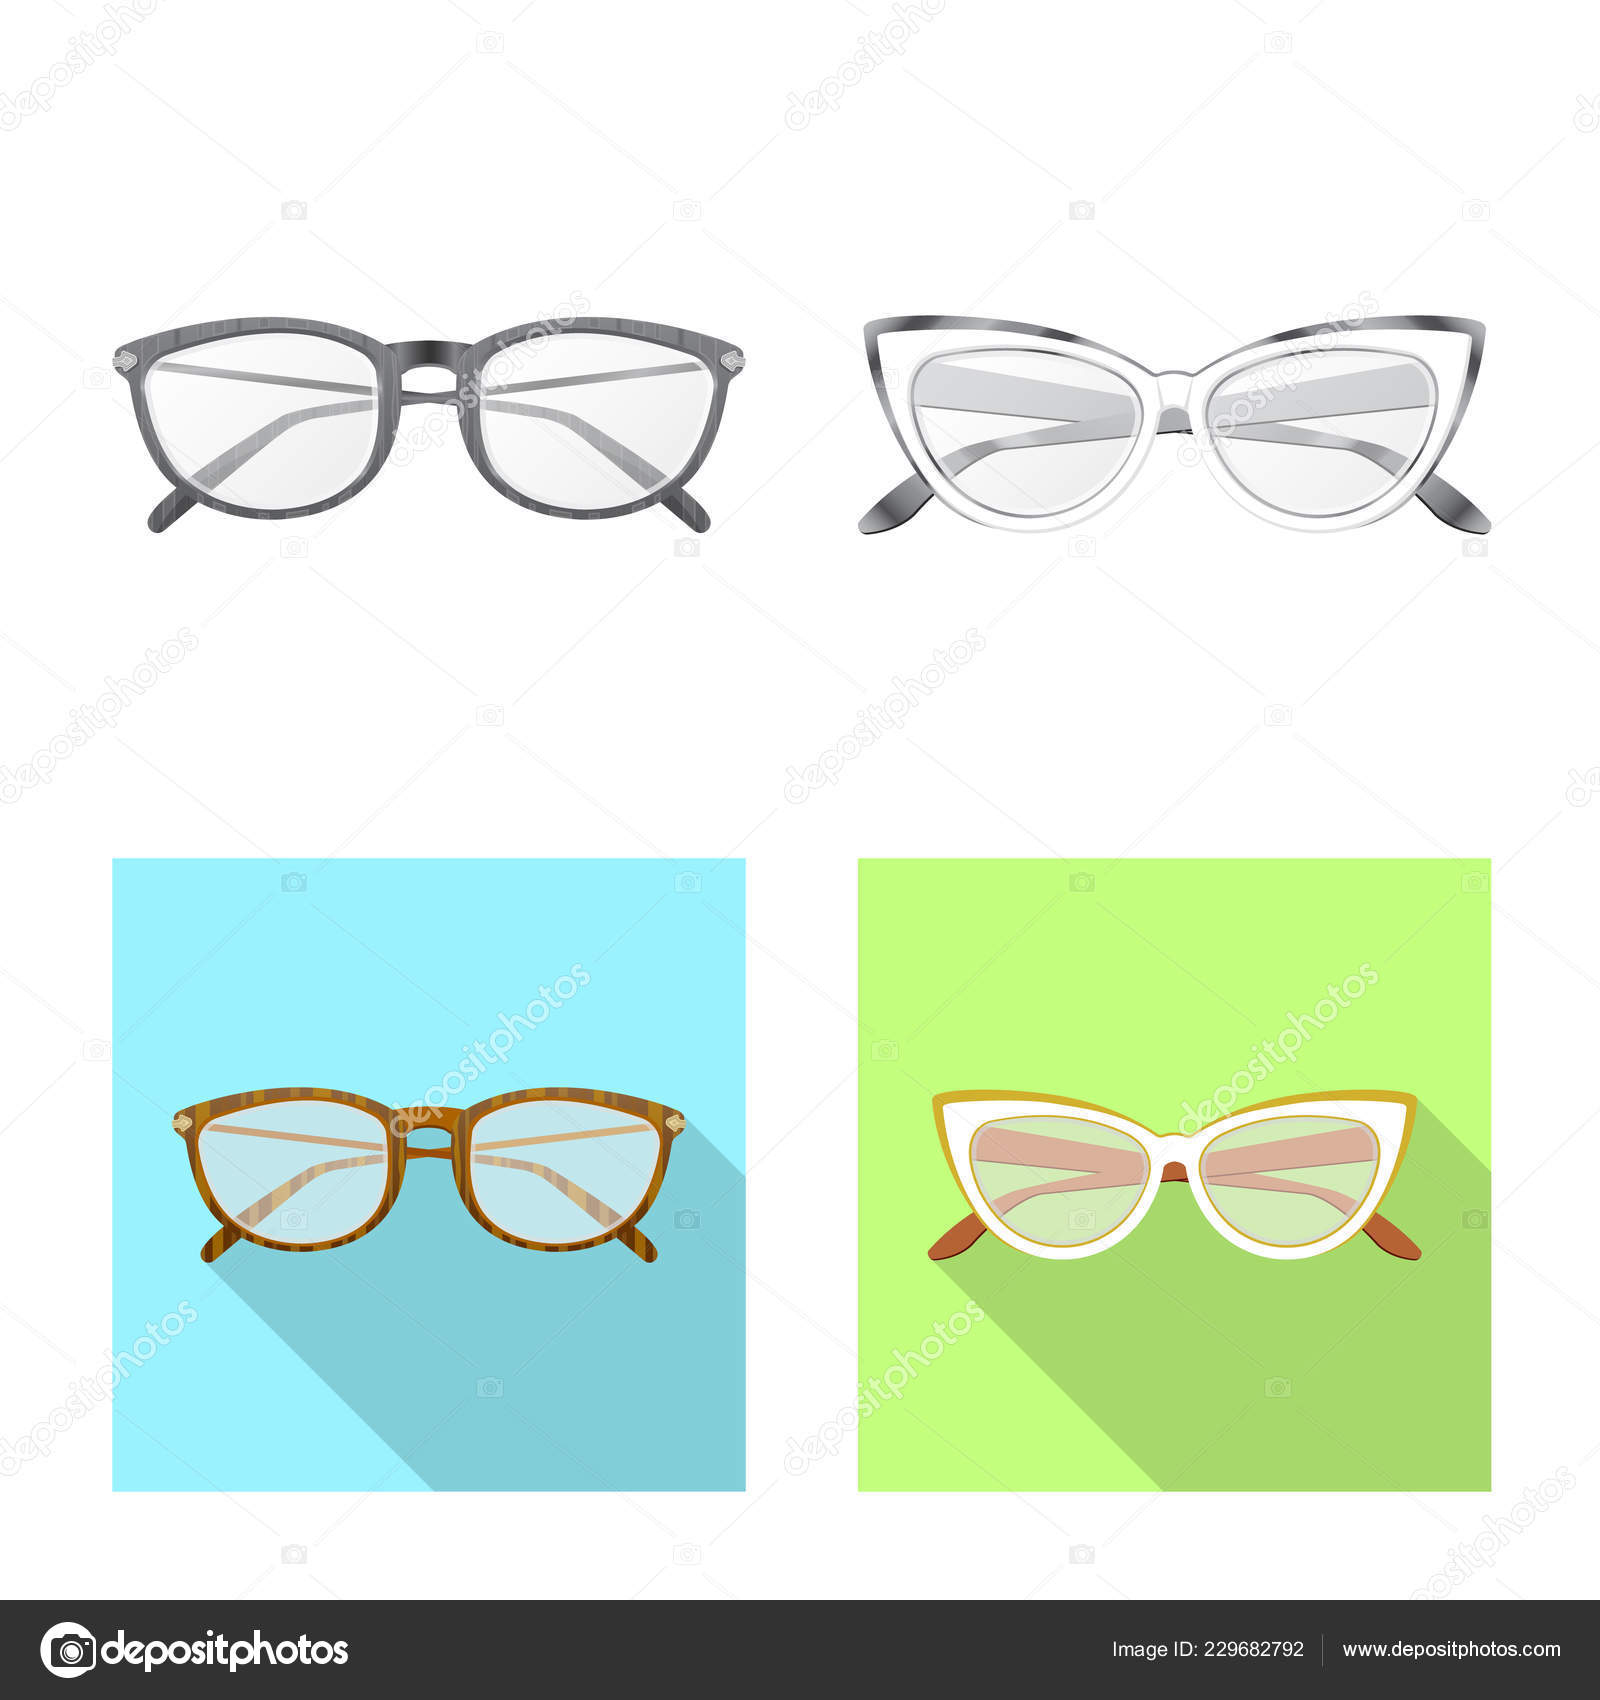 39cc2e8d12a0 Vector Illustration Glasses Frame Icon Collection Glasses Accessory Stock  Symbol — Stock Vector